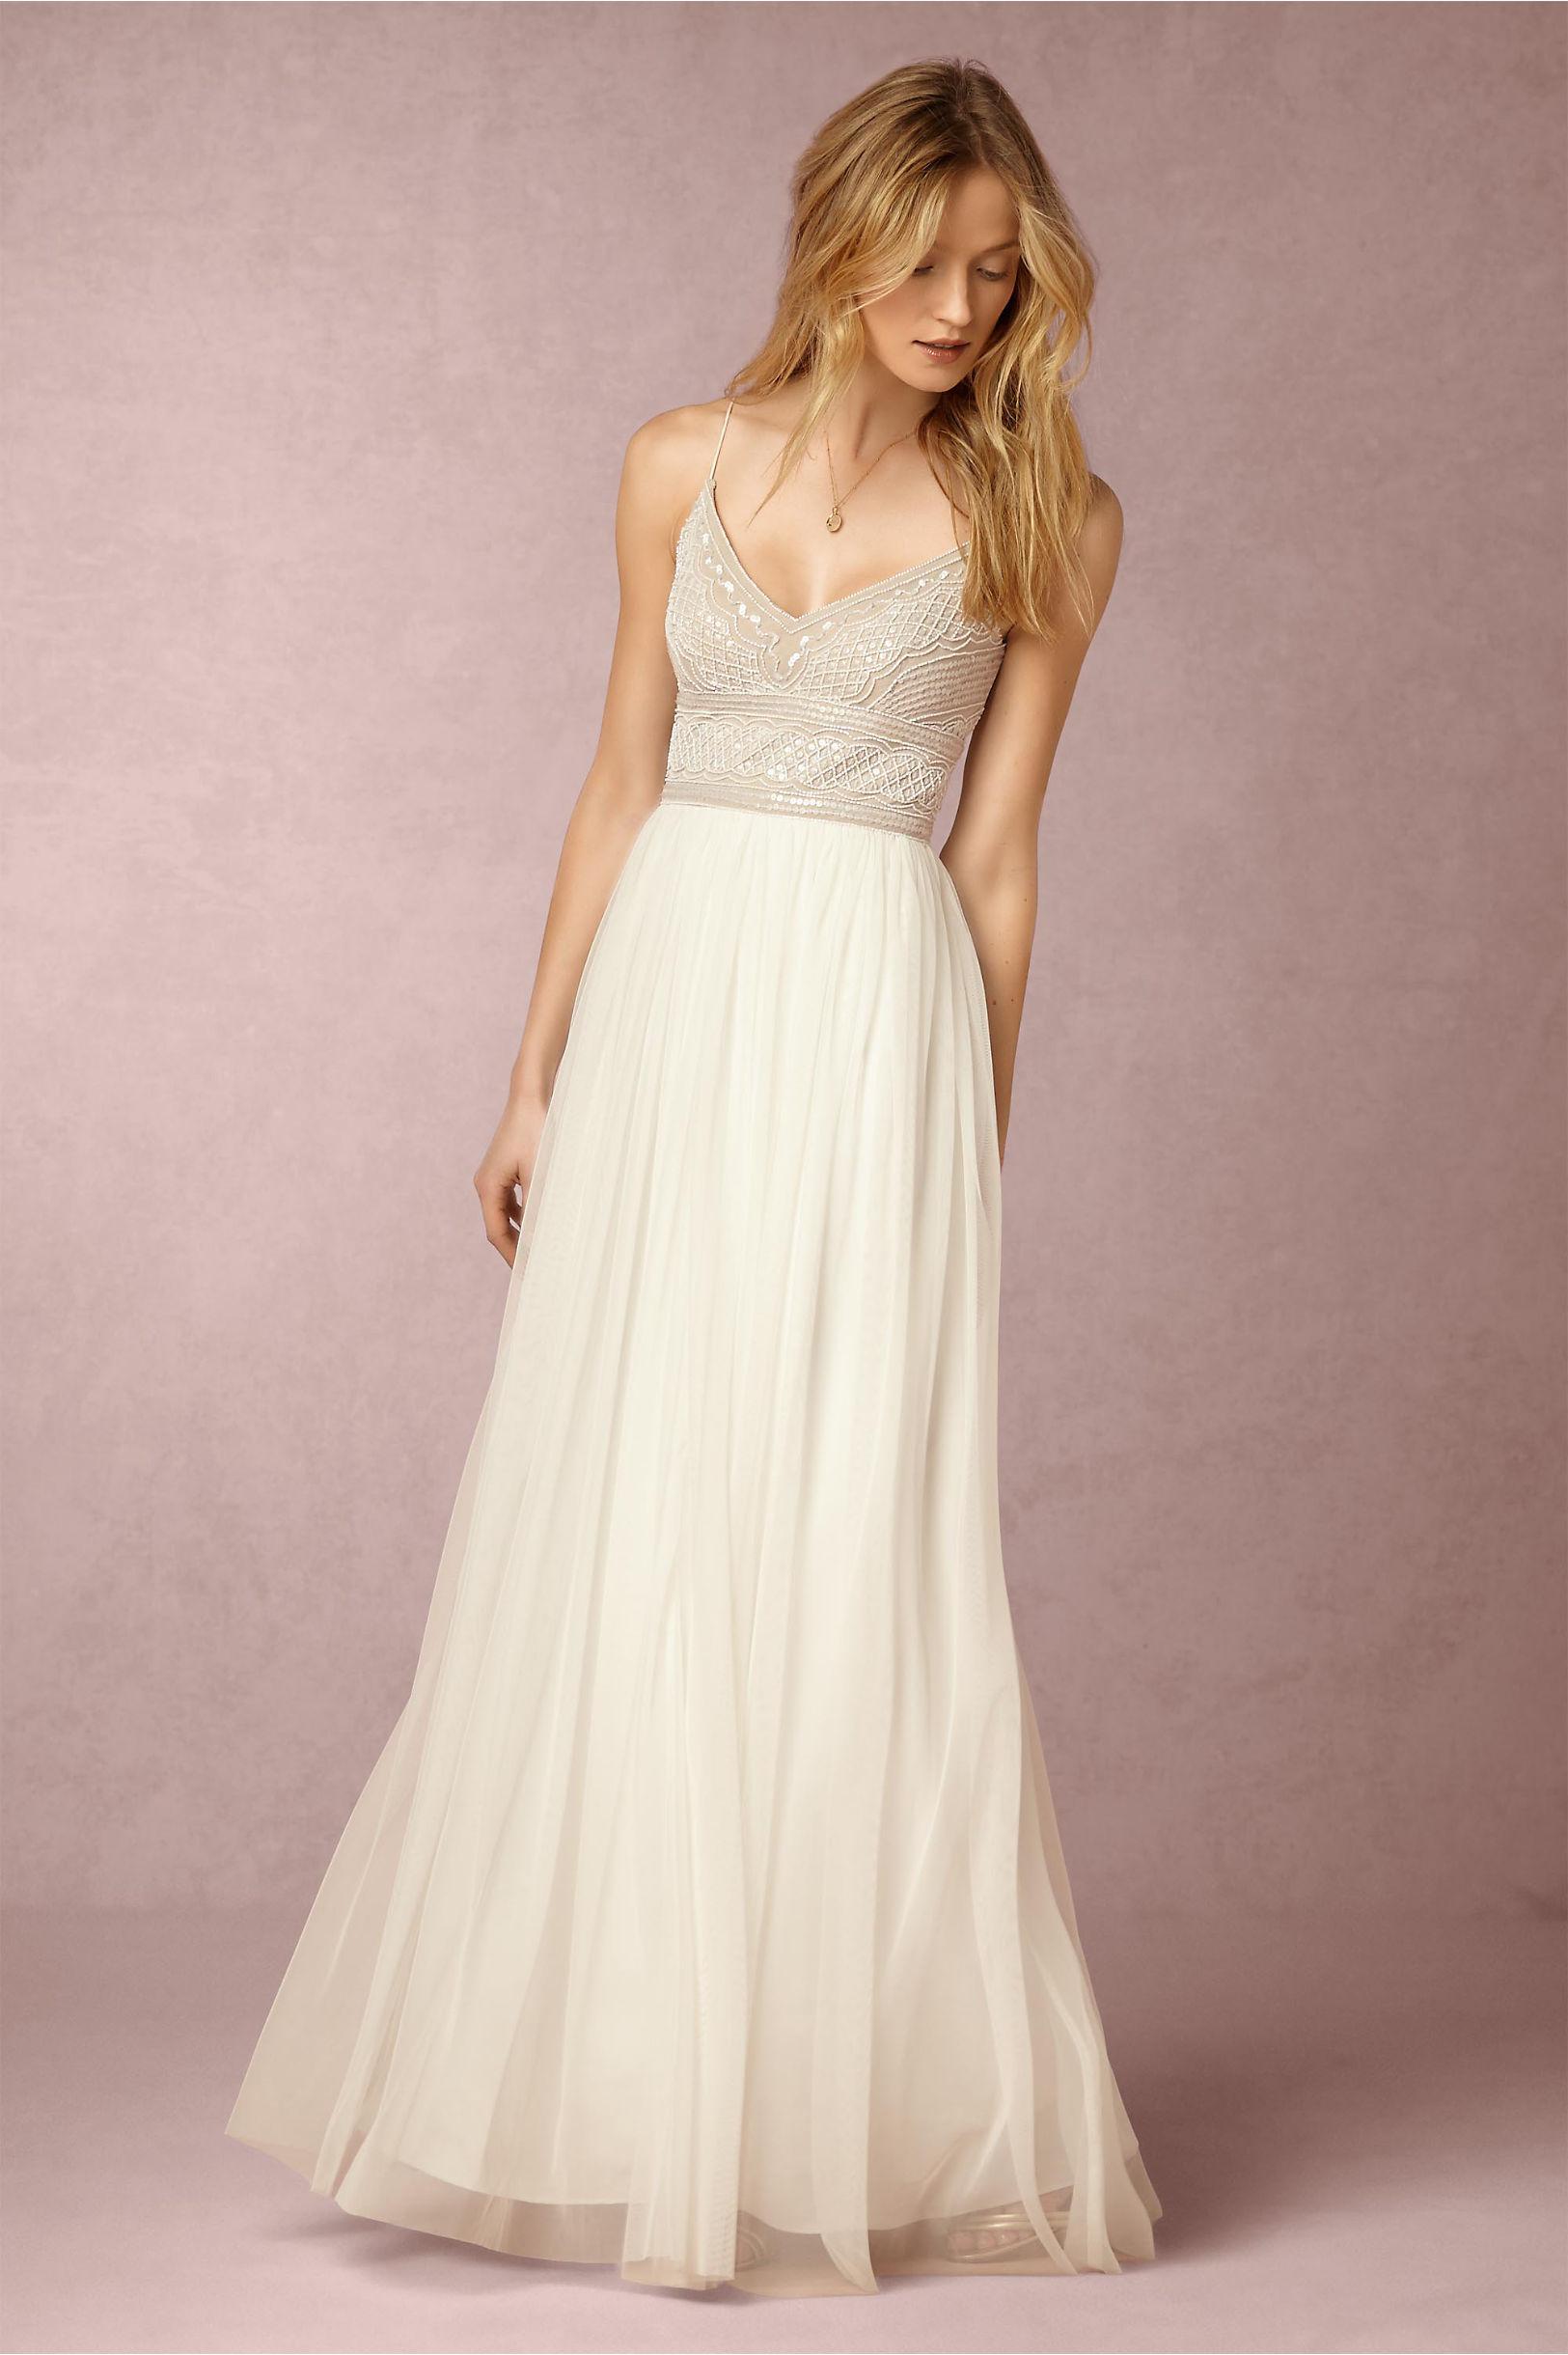 Naya Dress in Sale | BHLDN